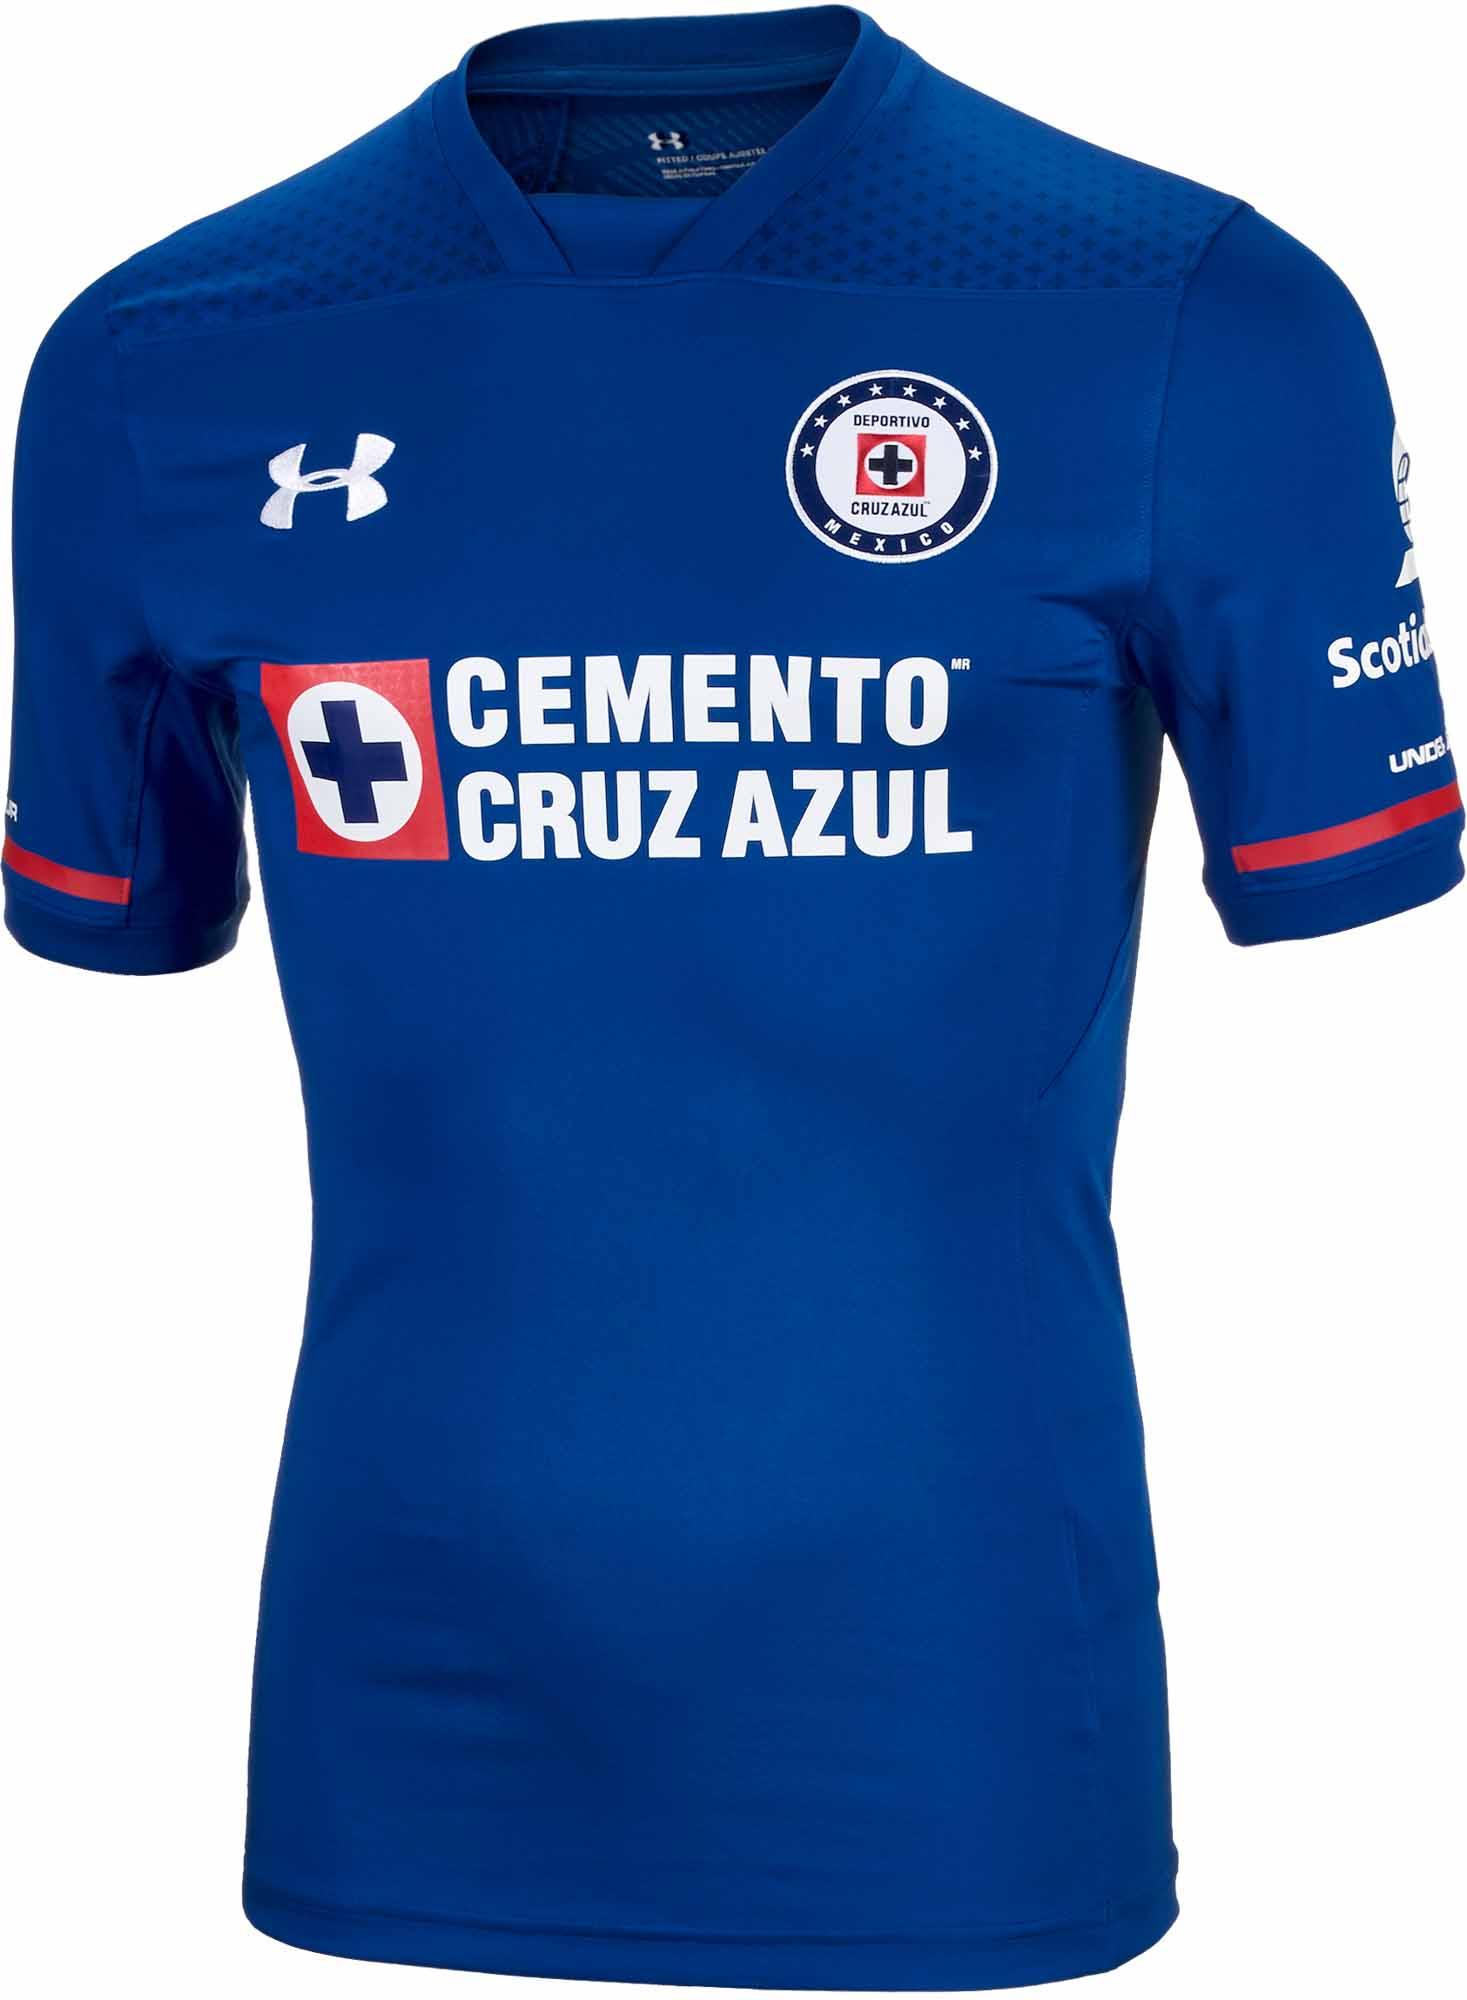 f748f95a301 Under Armour Cruz Azul Authentic Away Jersey 2017-18 - SoccerPro